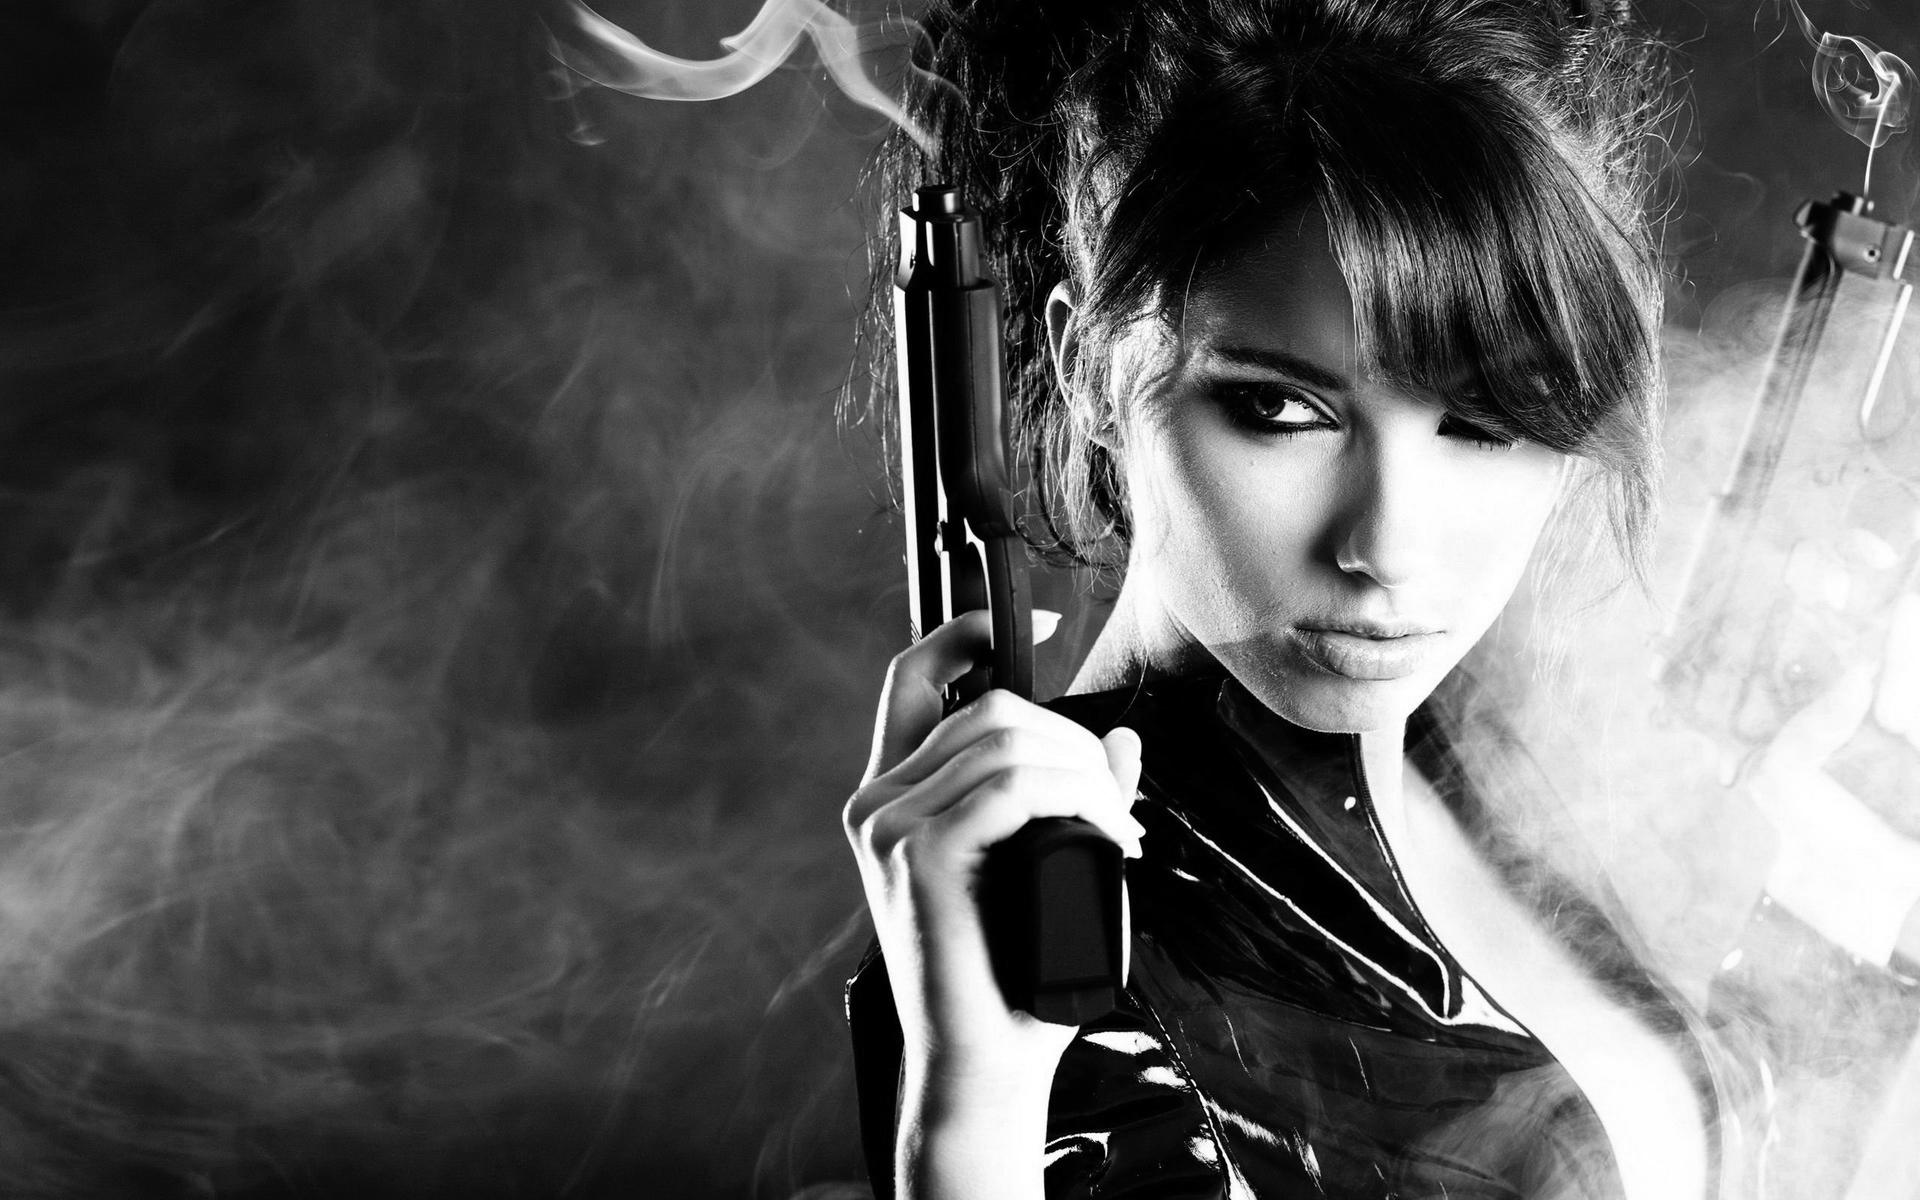 Desktop wallpaper celebrity female smoking